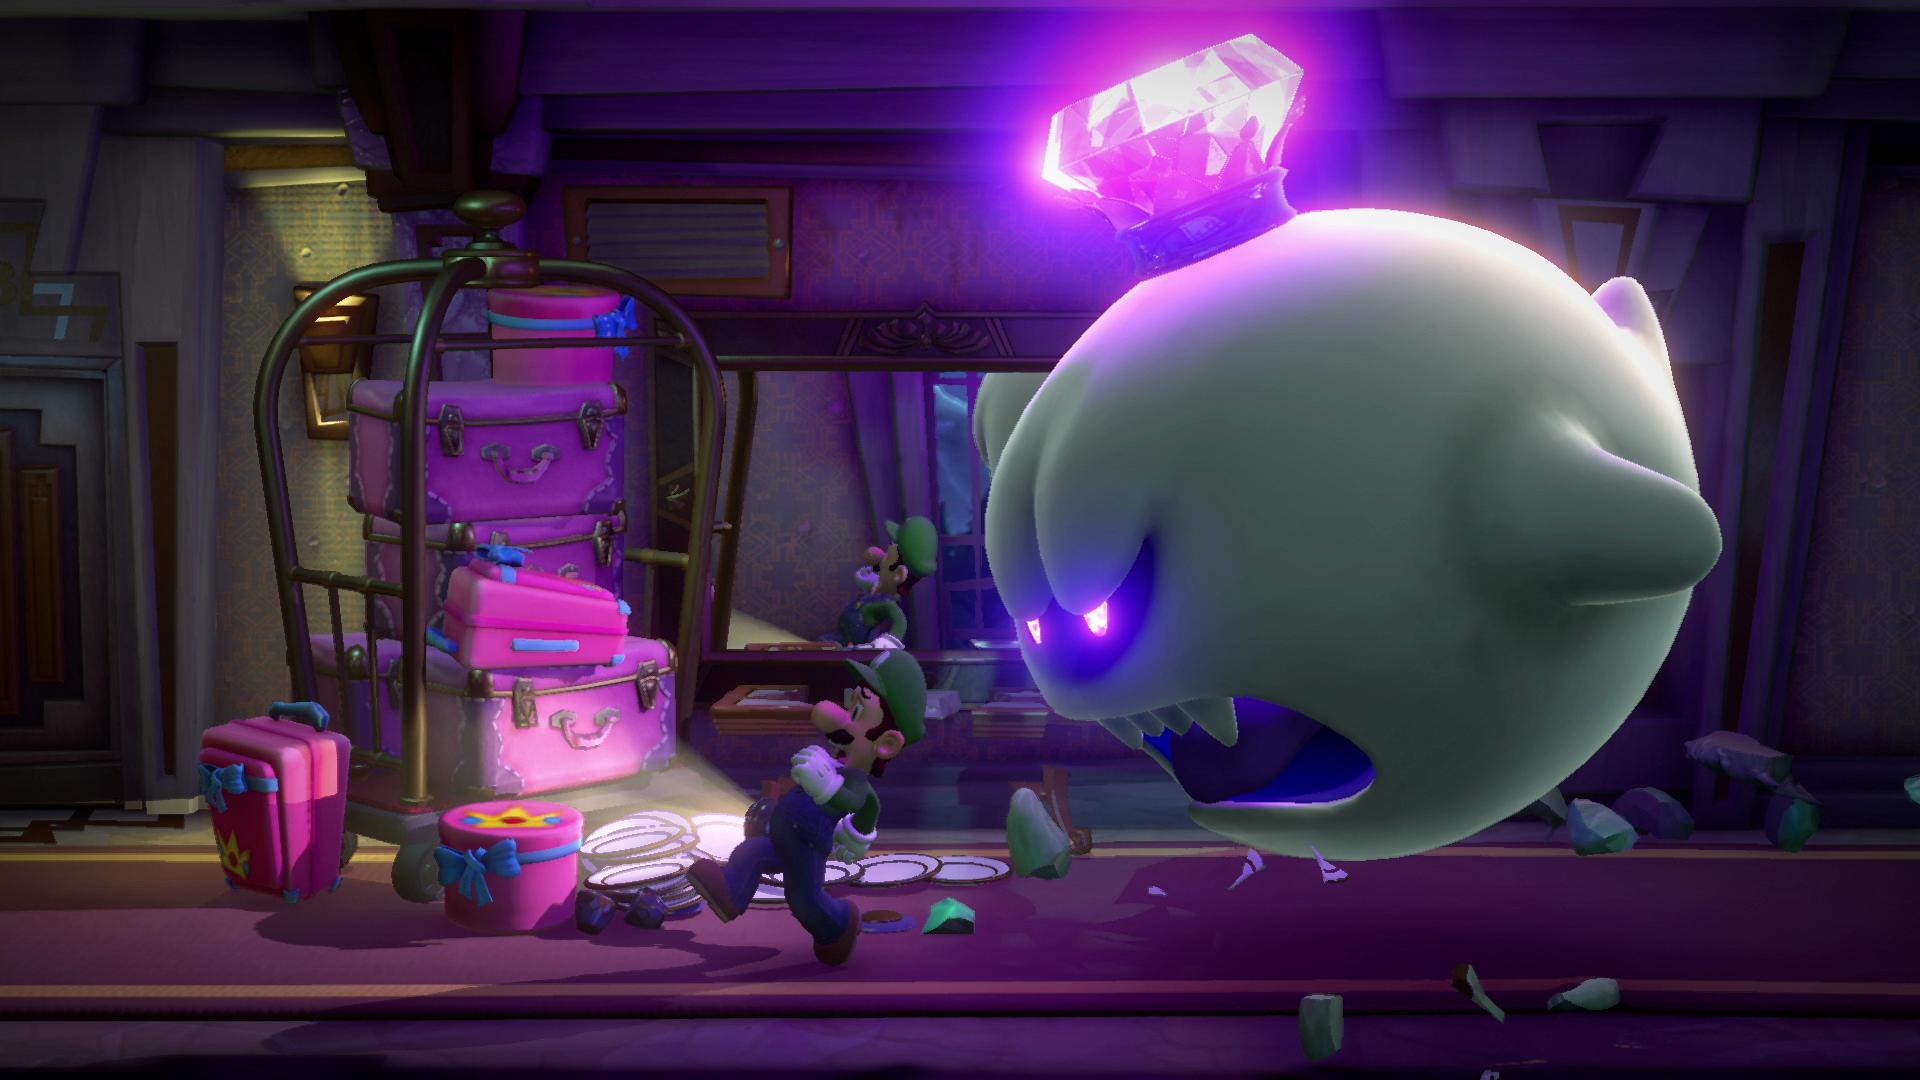 luigi fights a boss ghost in luigi's mansion 3